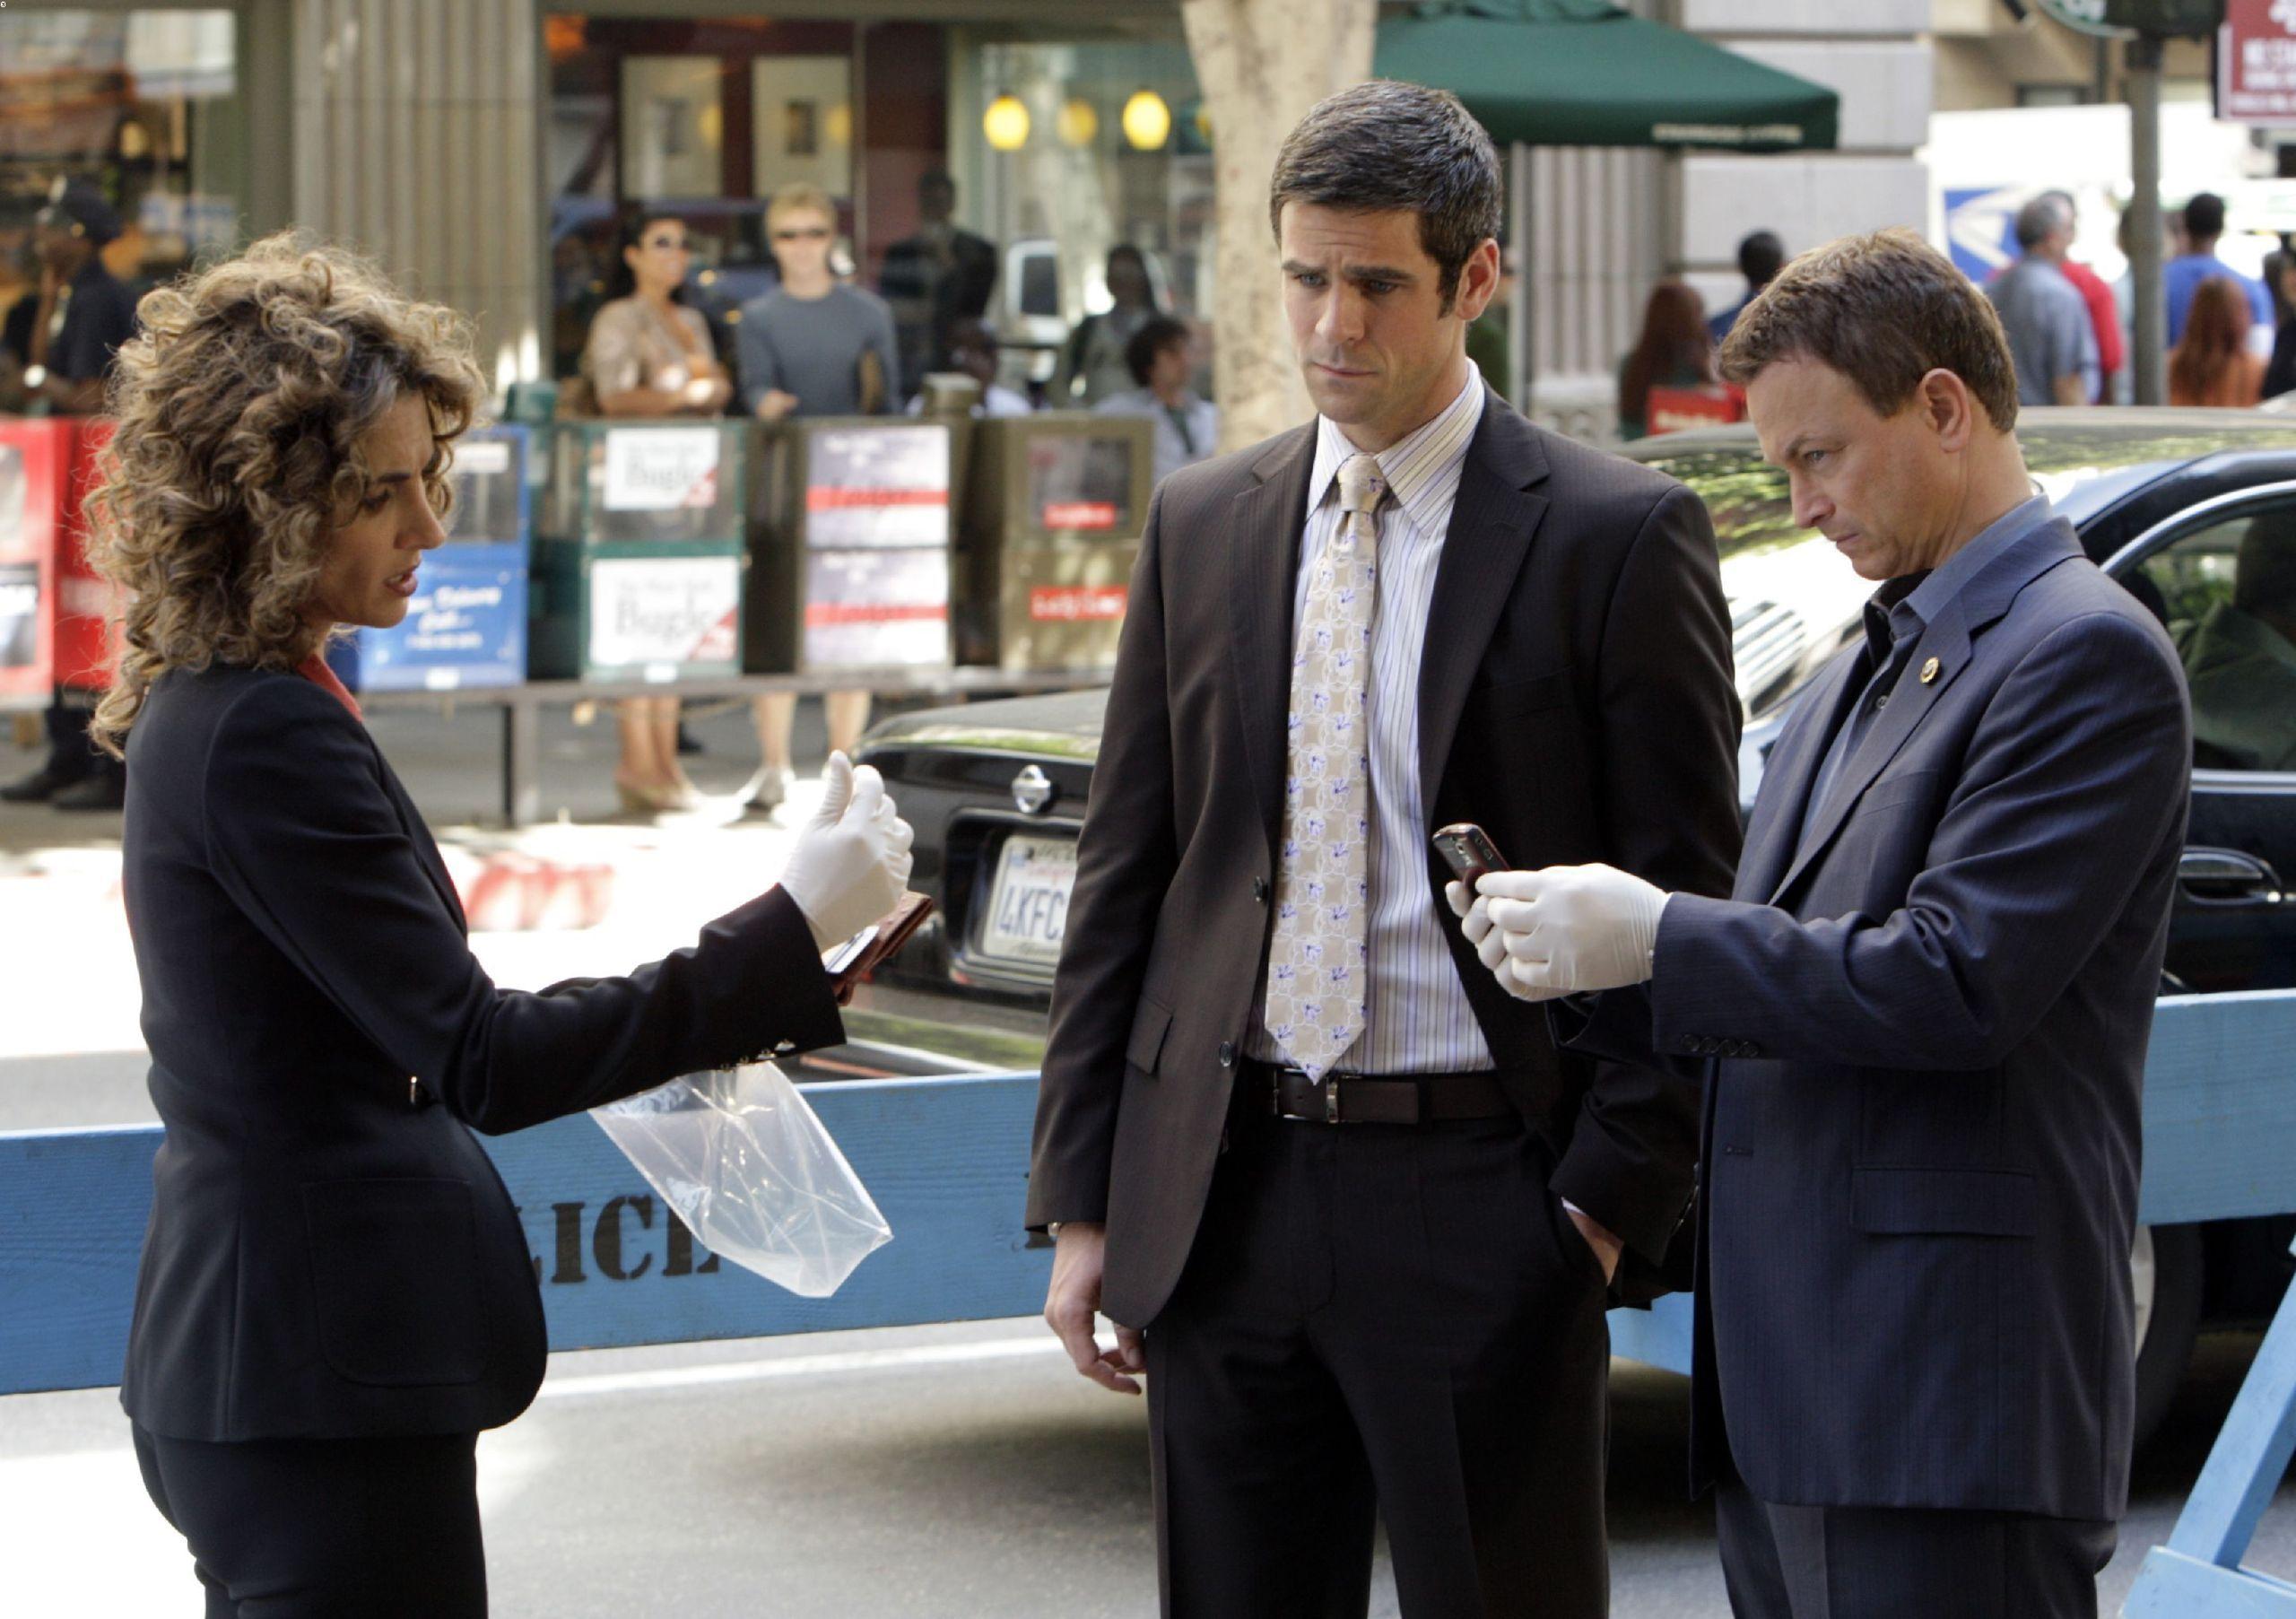 CSI-NY-Episode-5-04-Sex-Lies-And-Silicone-Promotional-Photos-csi-ny-2395821-2560-1805.jpg (2560×1805)